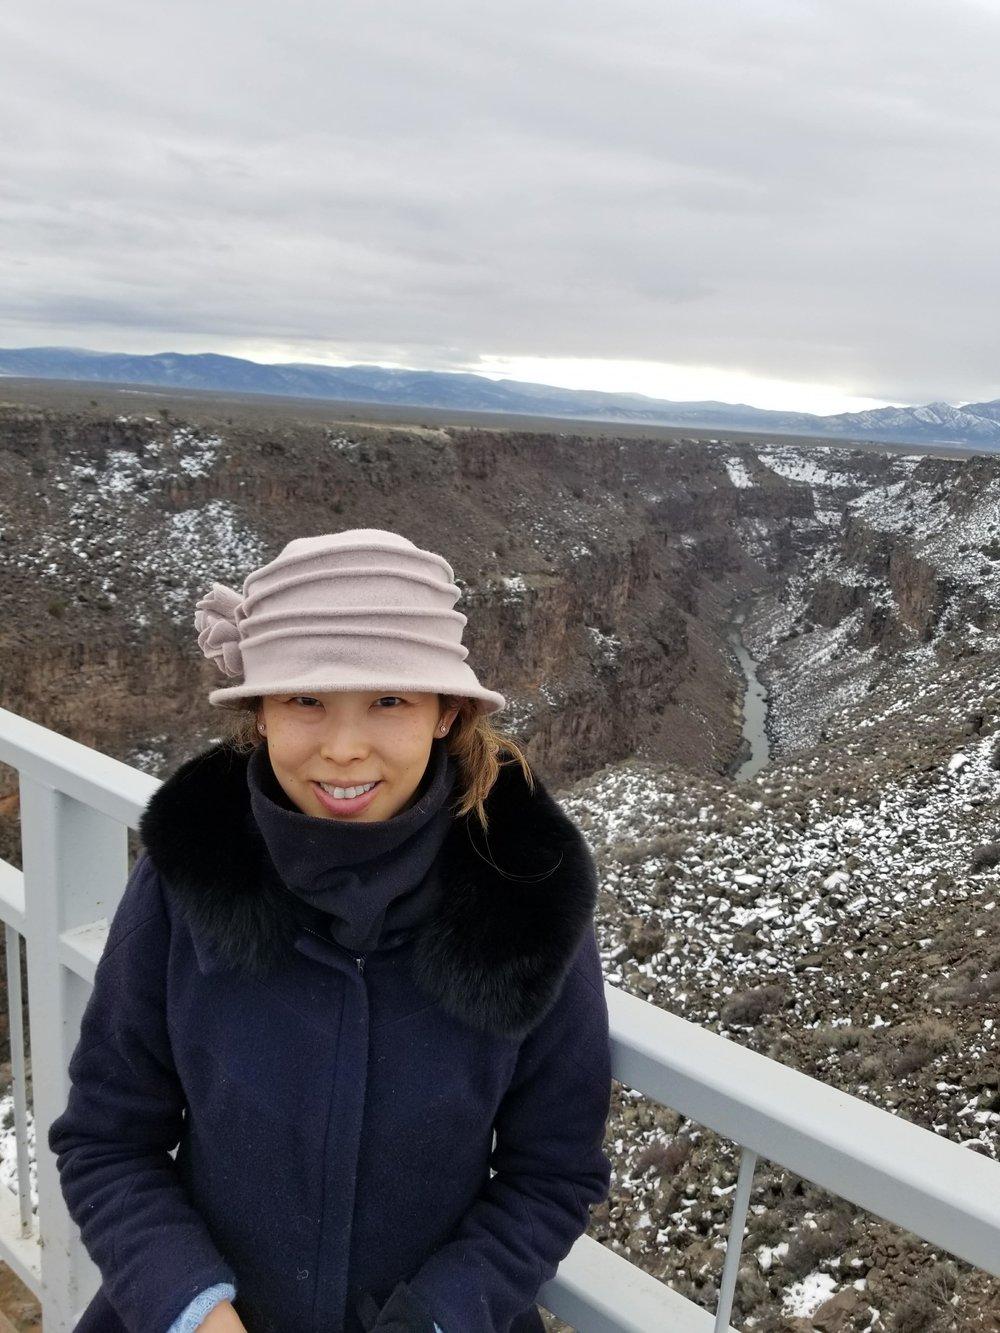 The Rio Grande River Gorge has amazing views